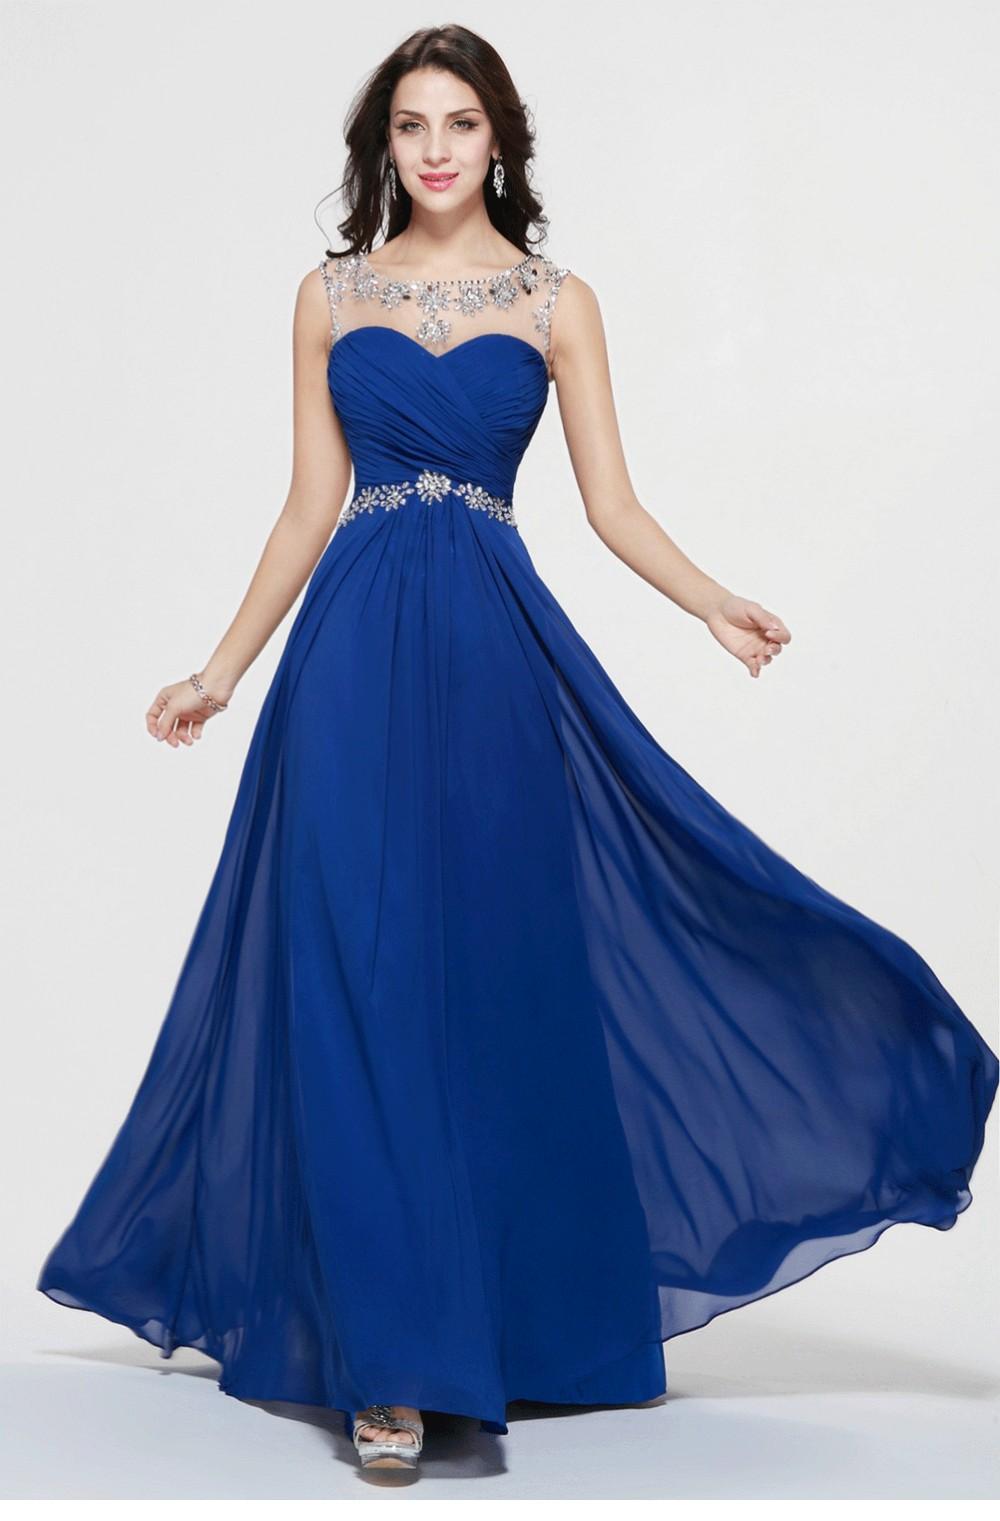 55739df20ce3 Nové plesové šaty vel 38